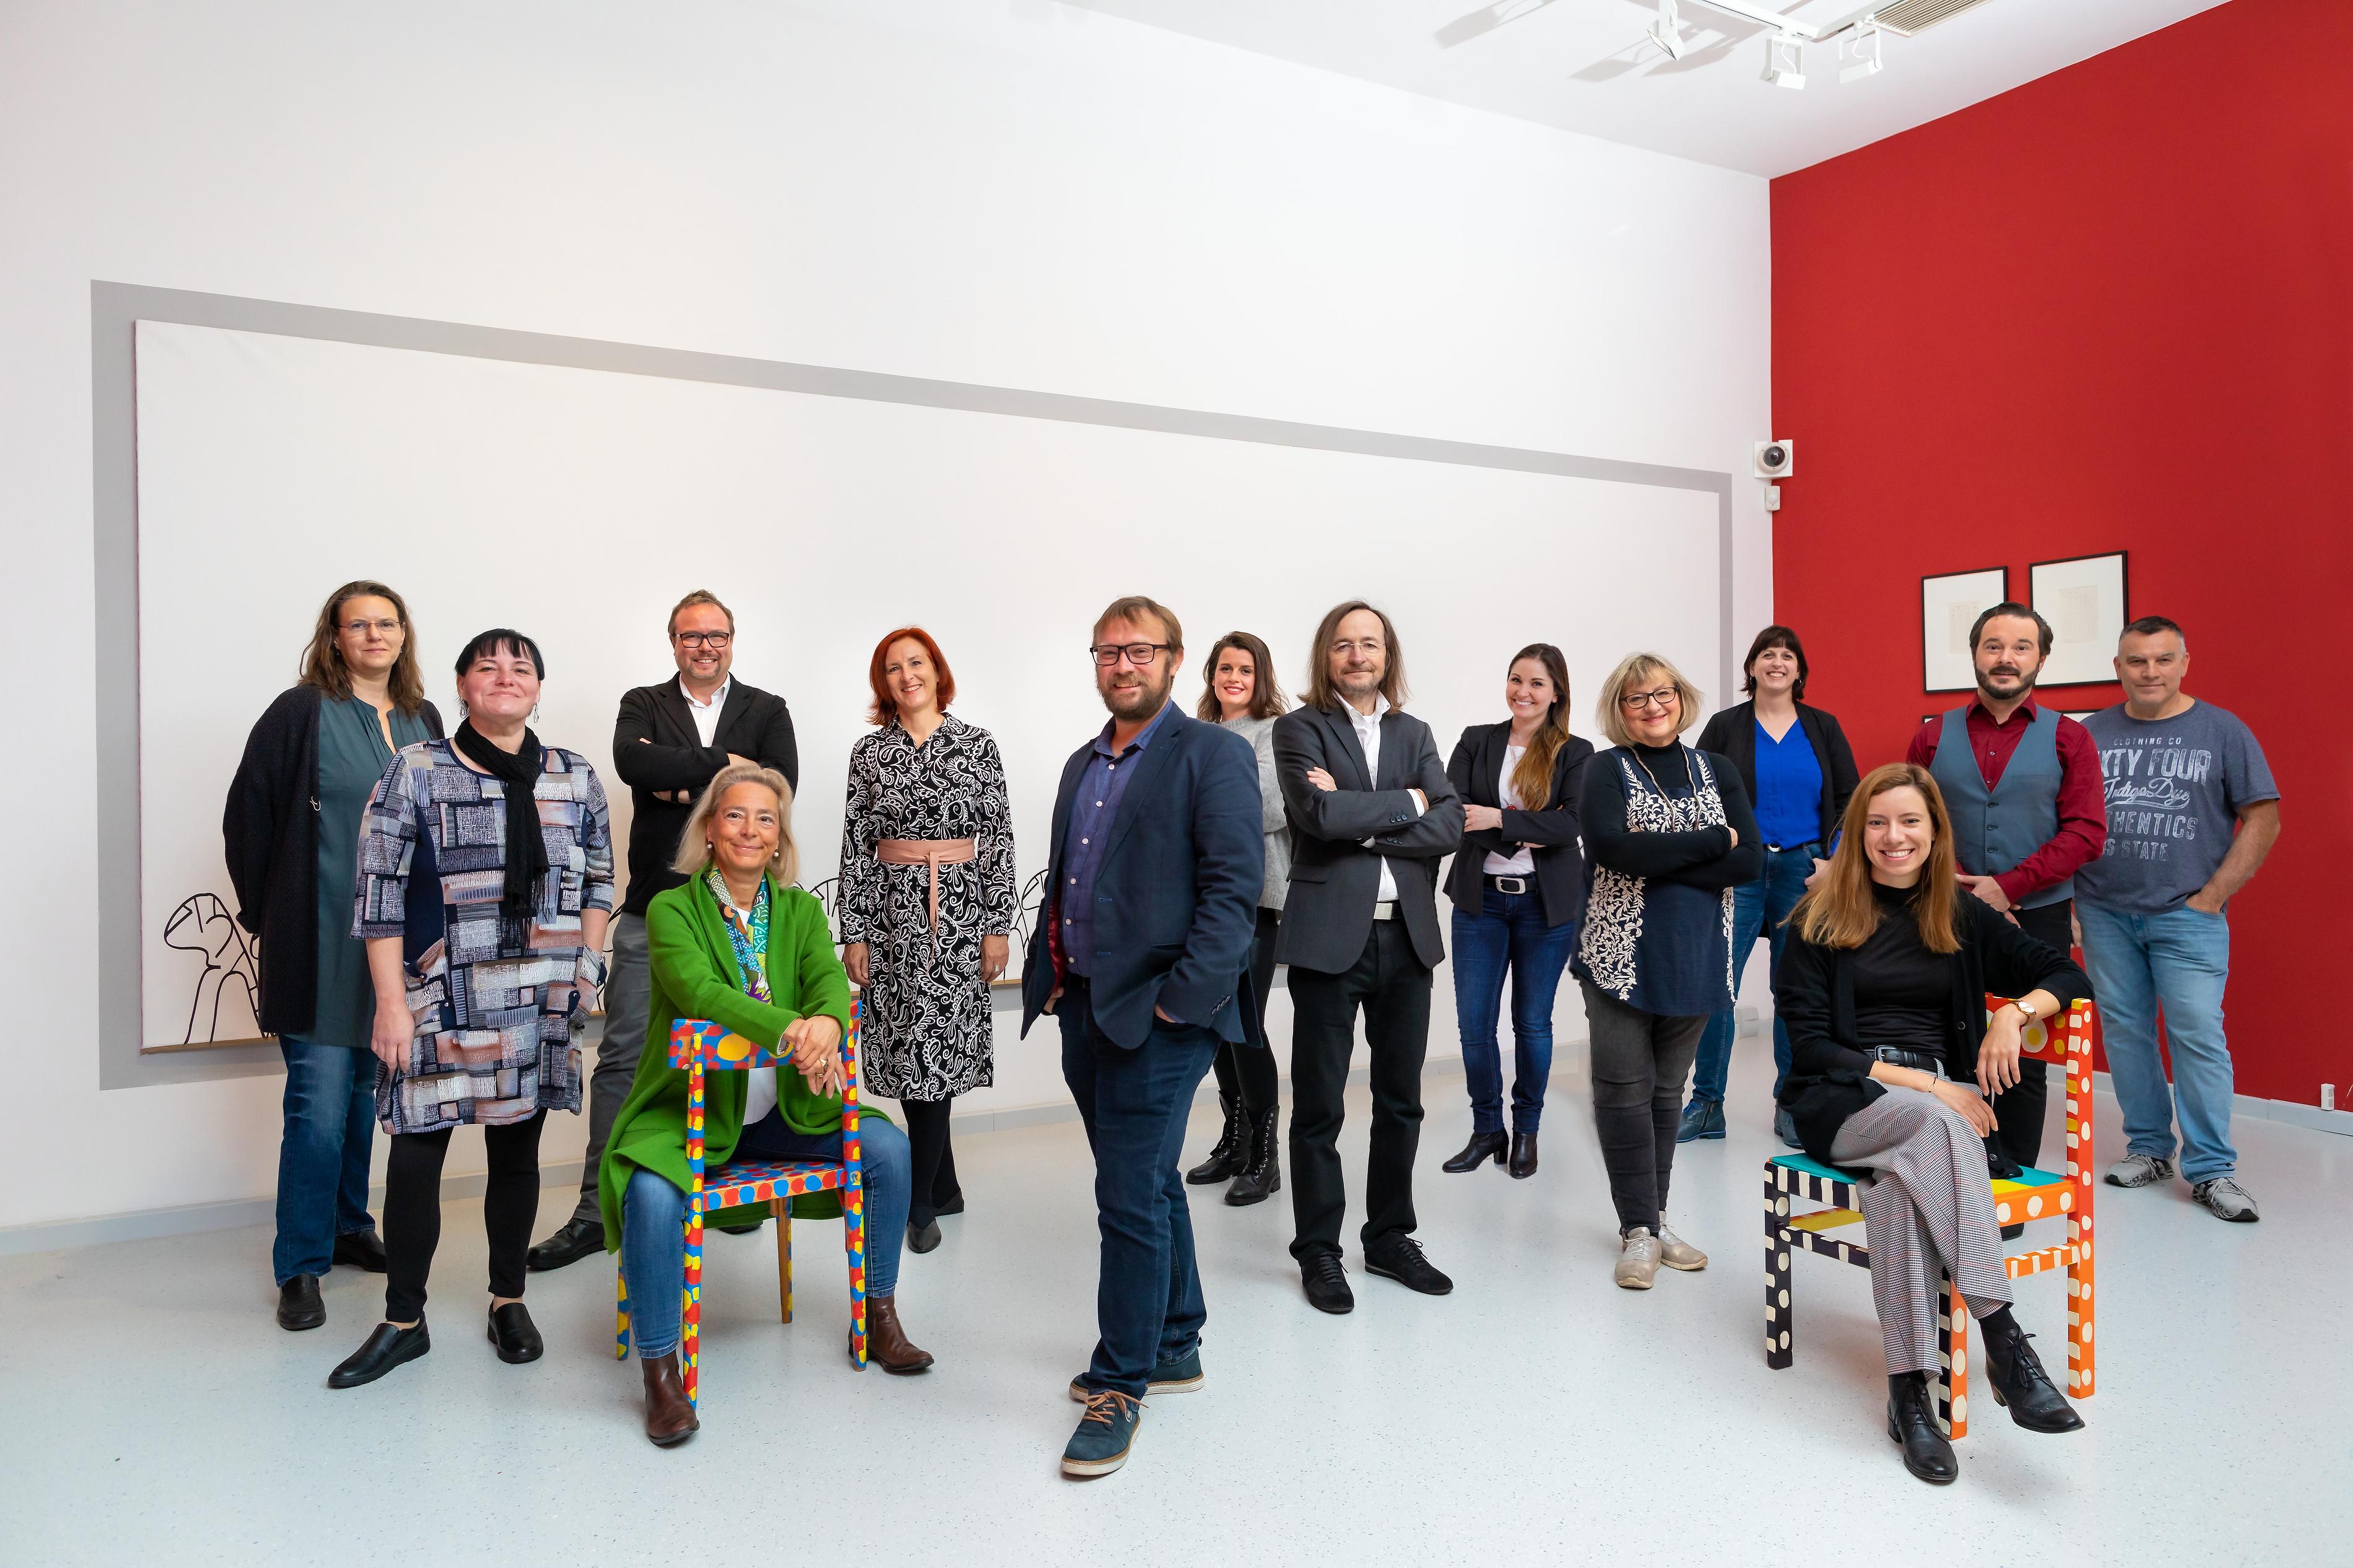 Teamfoto 2021, Foto: Ludwig Schedl